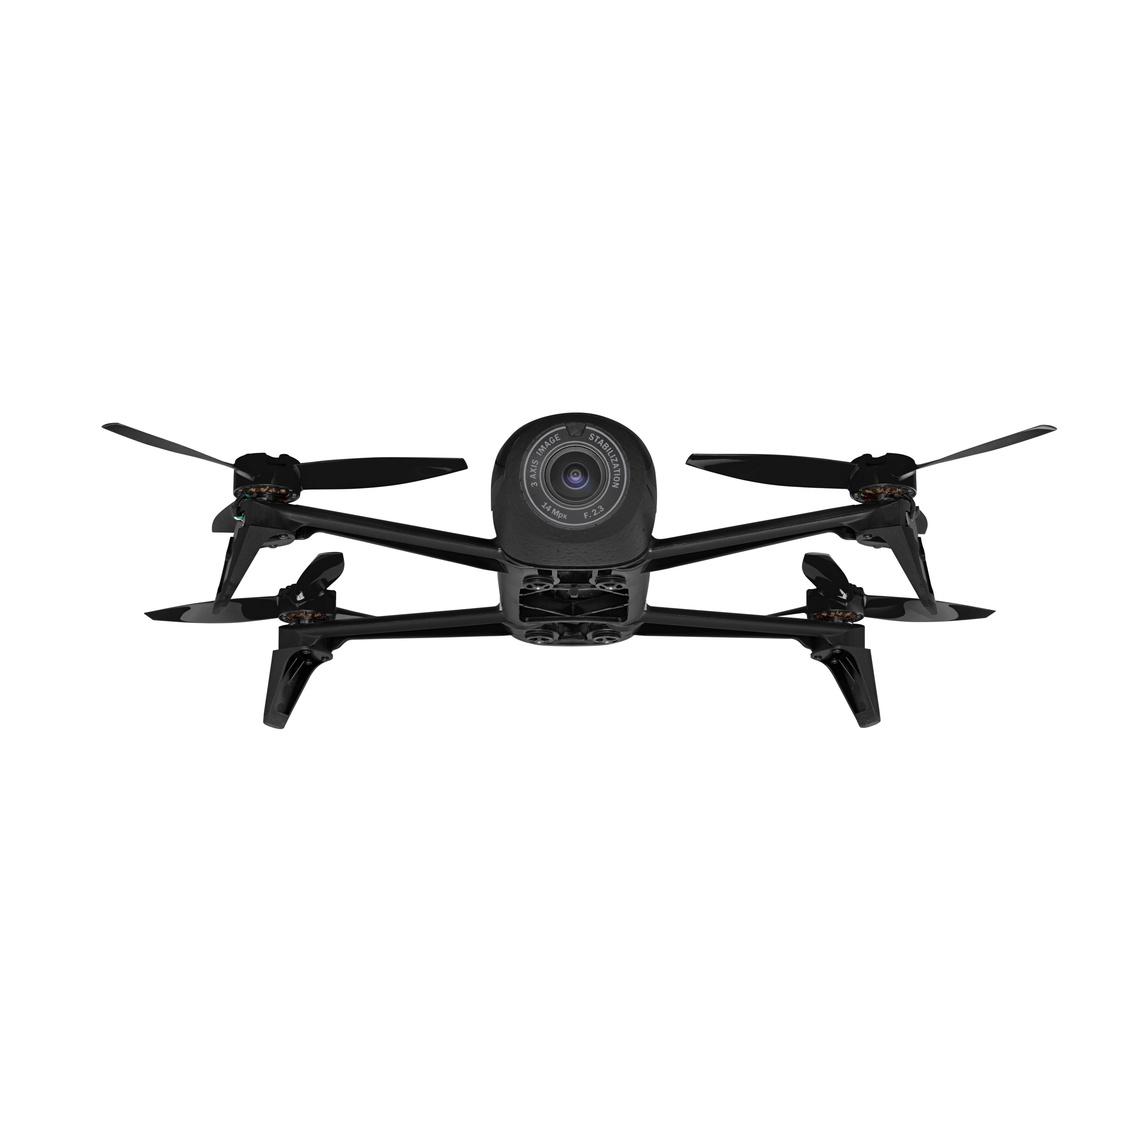 Parrot Bebop 2 Power Drone FPV Pack